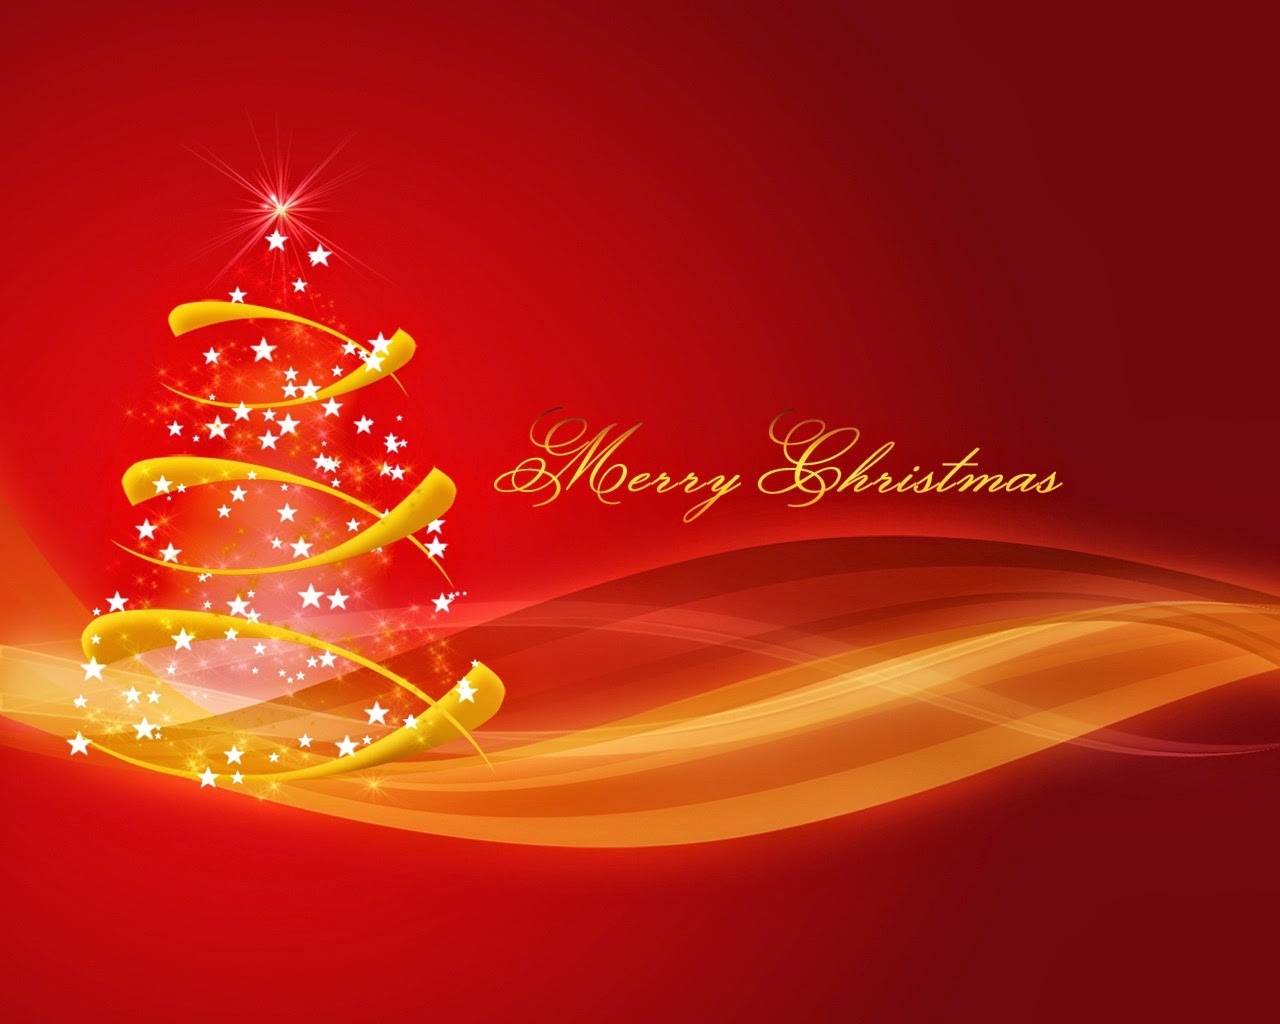 Merry Christmas, Happy Holidays, Christmas, Joy, love, fun, Christmas season, logo, happy, Season Greetings, Feliz Navidad